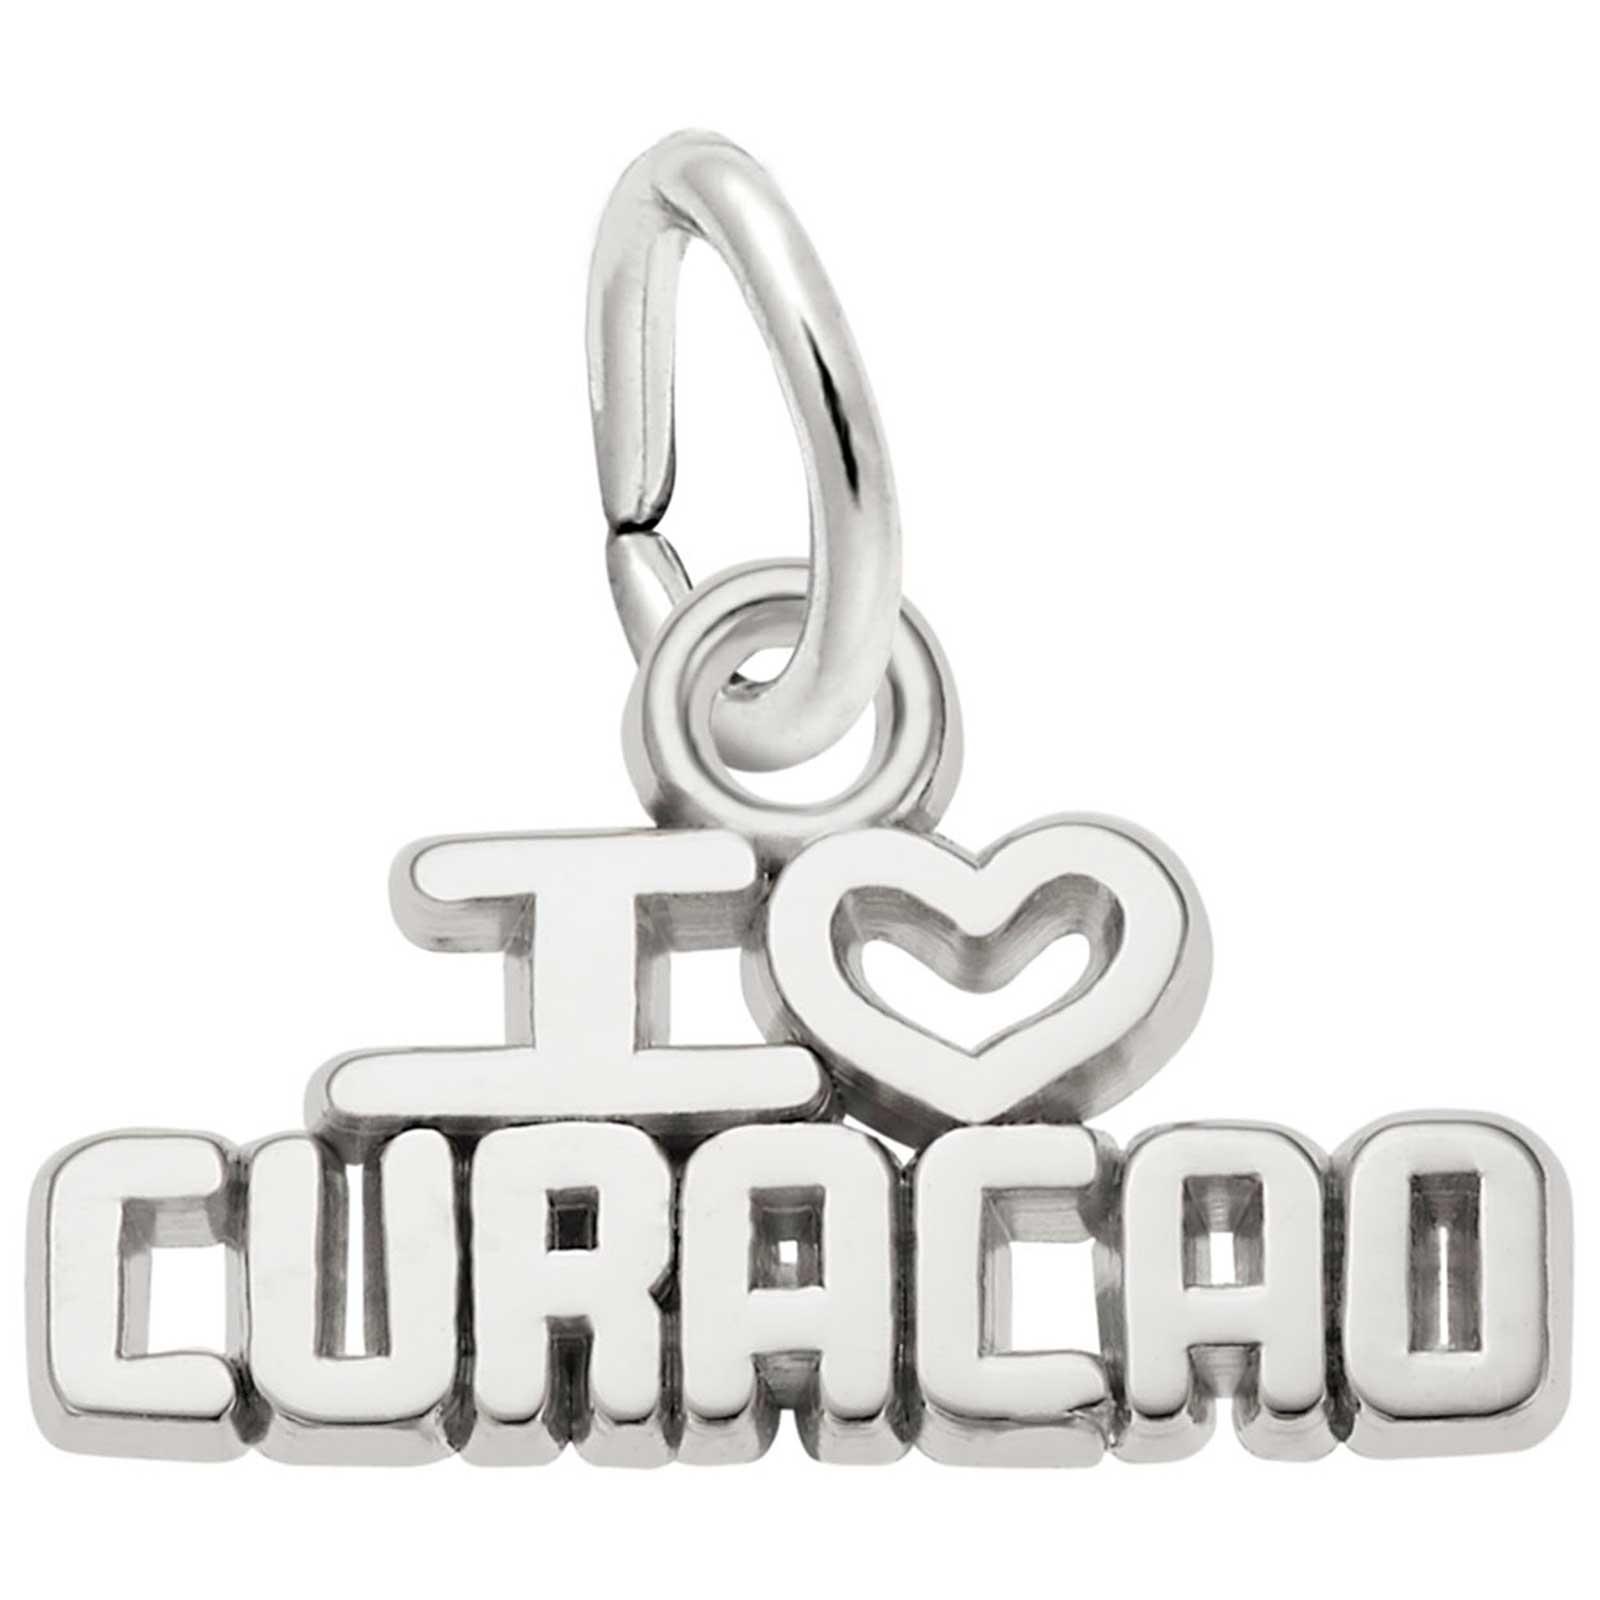 9ce1596f4 Rembrandt Curacao Charm, Sterling Silver: Precious Accents, Ltd.